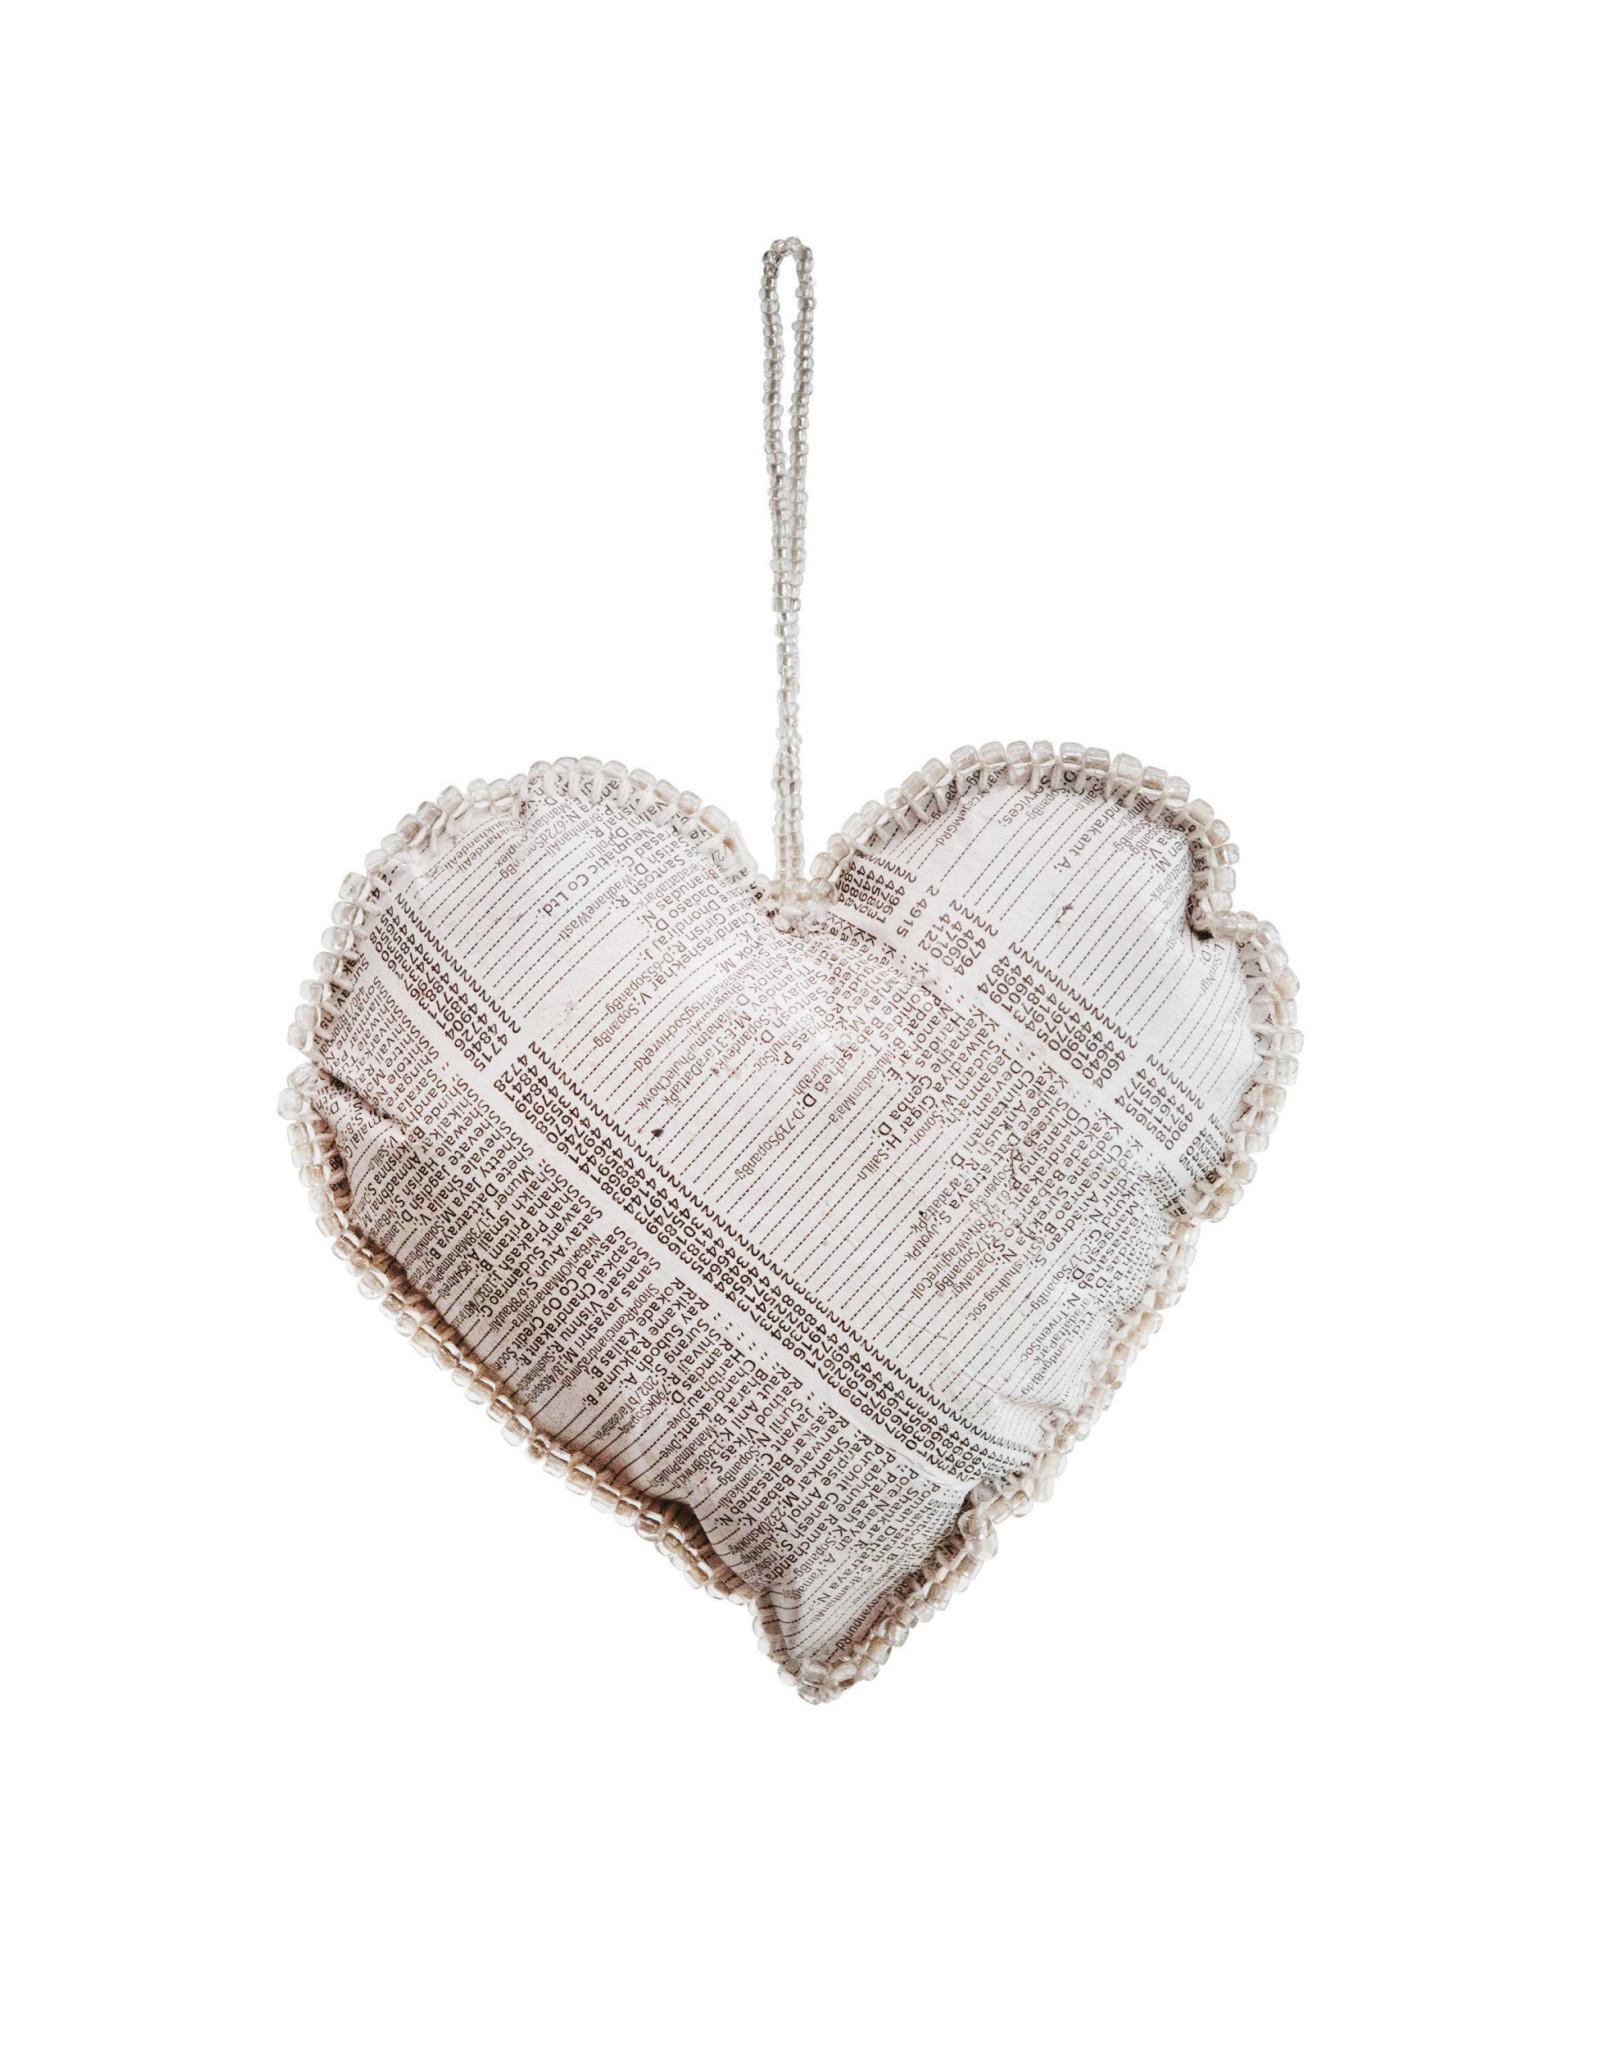 "Wink Paper Heart Ornament w/Mercury Glass Beads 3.5"""